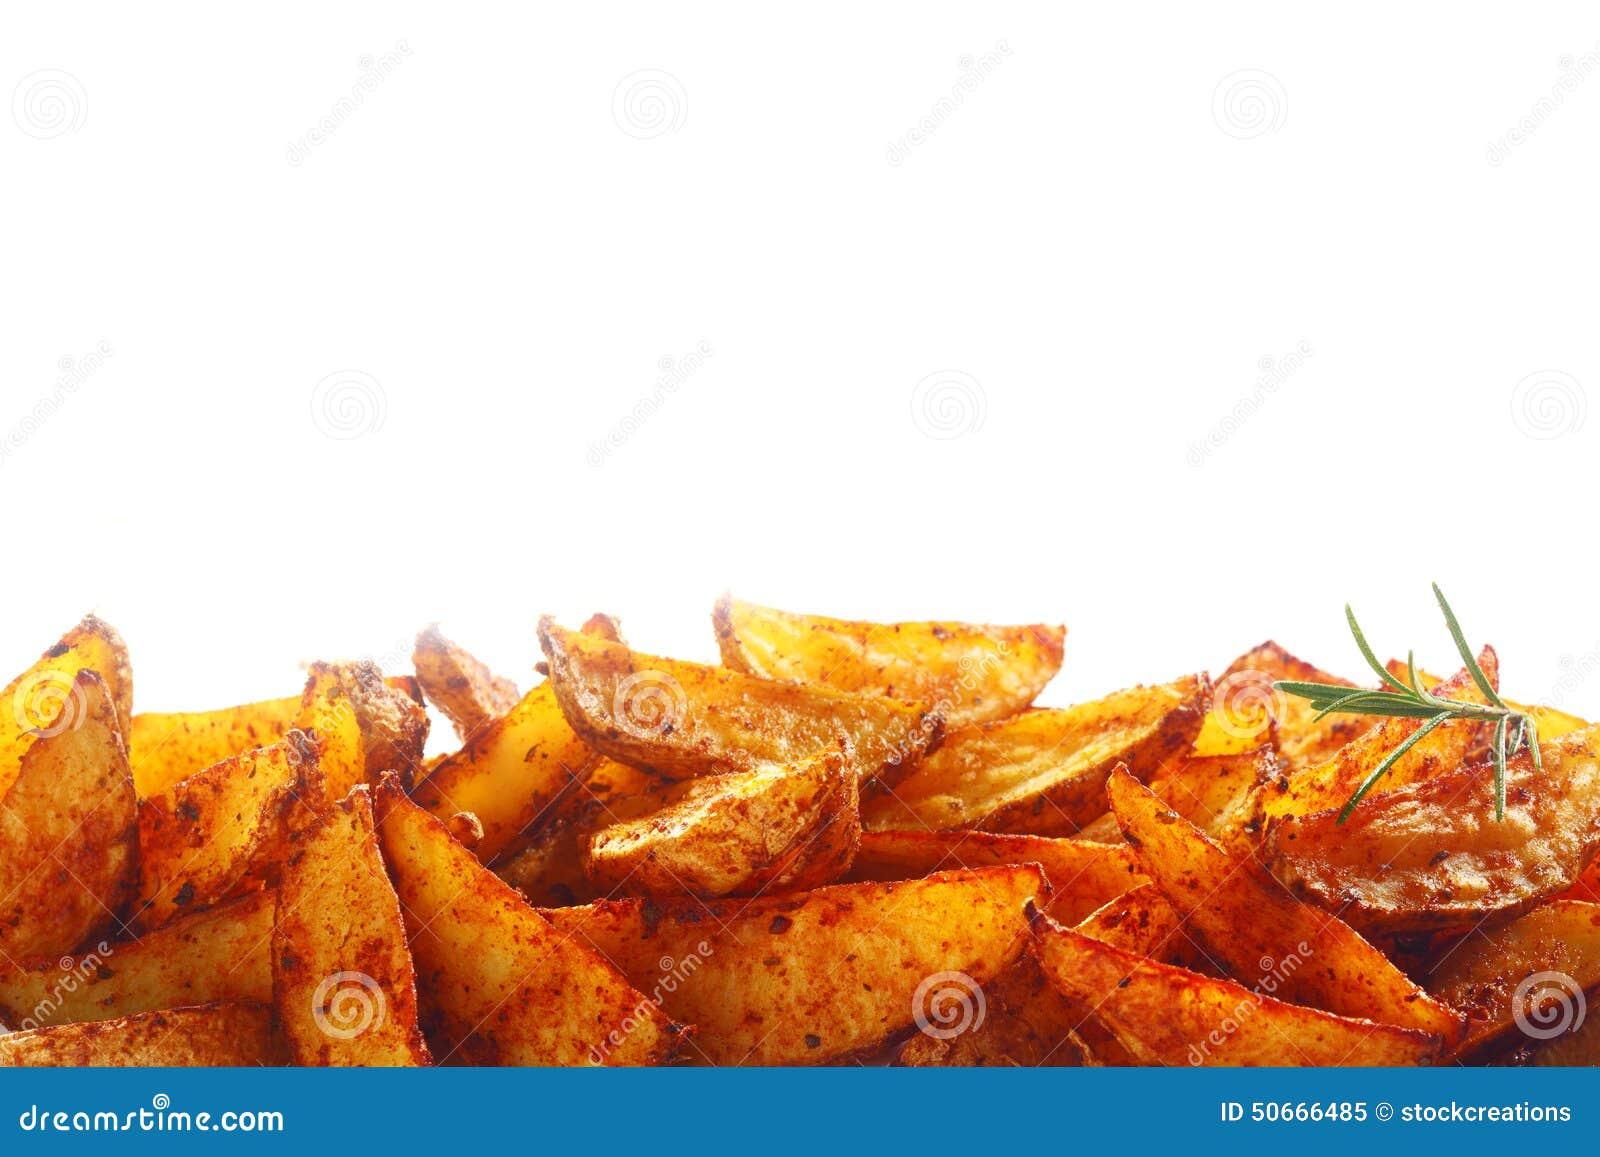 Where To Buy Sweet Potato Fries Fast Food